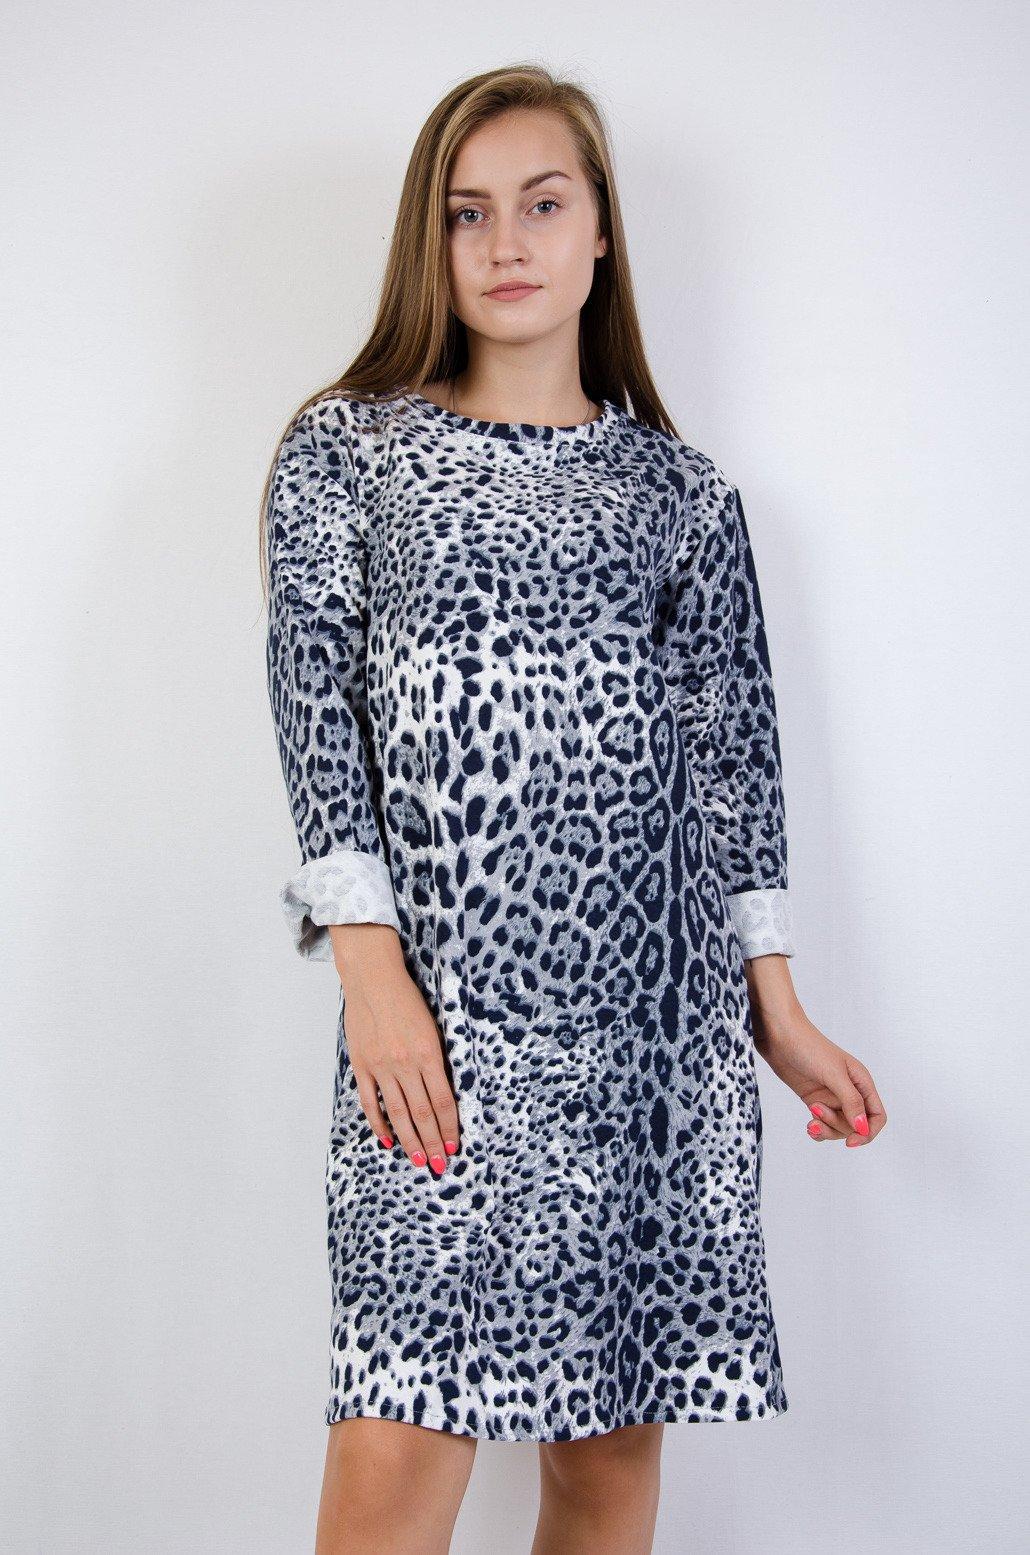 d686da32 Niebieska dzianinowa sukienka w panterkę